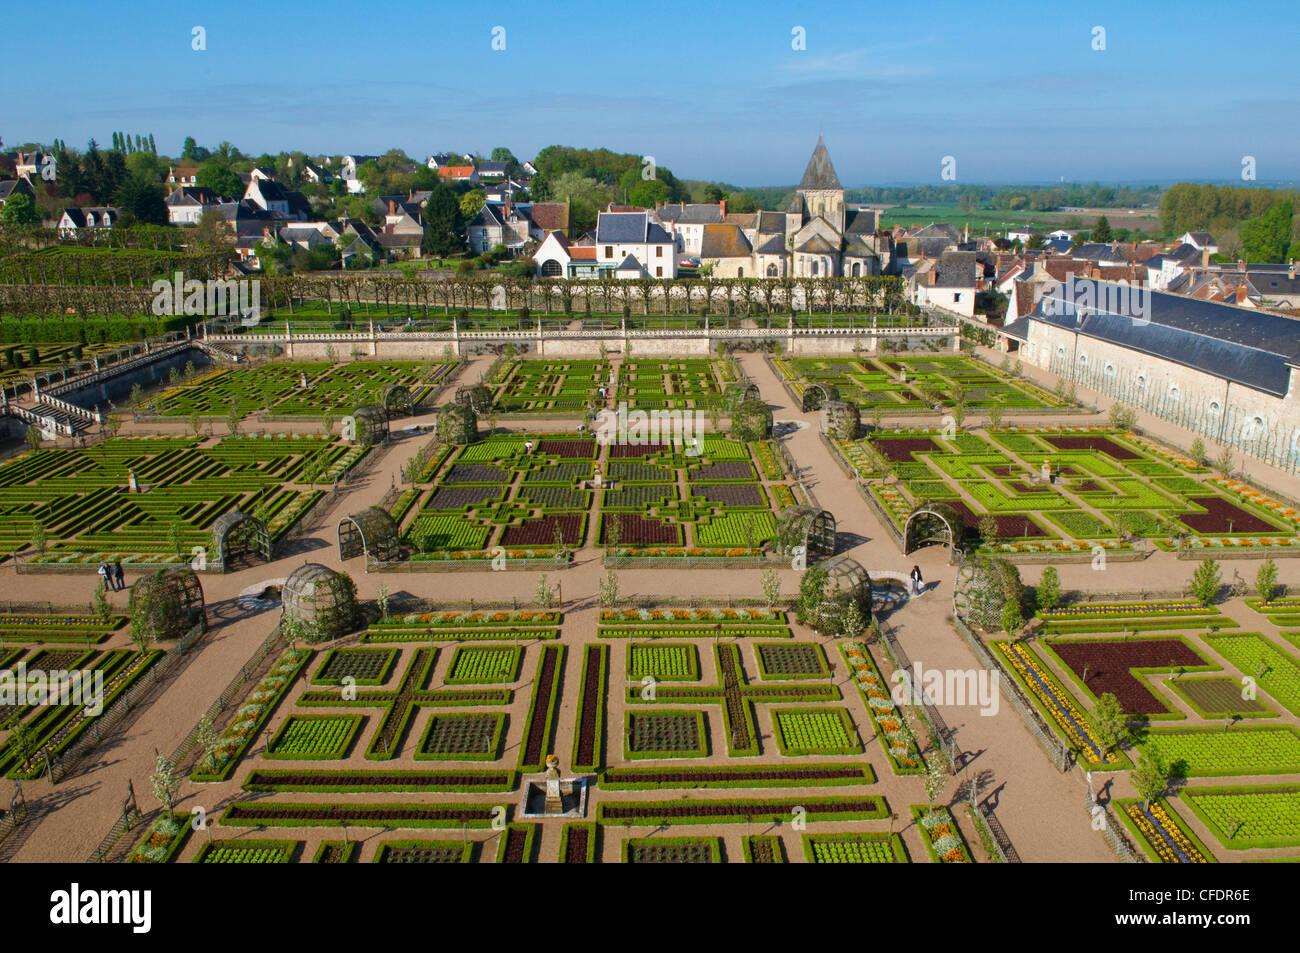 Formal garden at the Chateau de Villandry, UNESCO World Heritage Site, Loire Valley, Indre et Loire, France, Europe - Stock Image